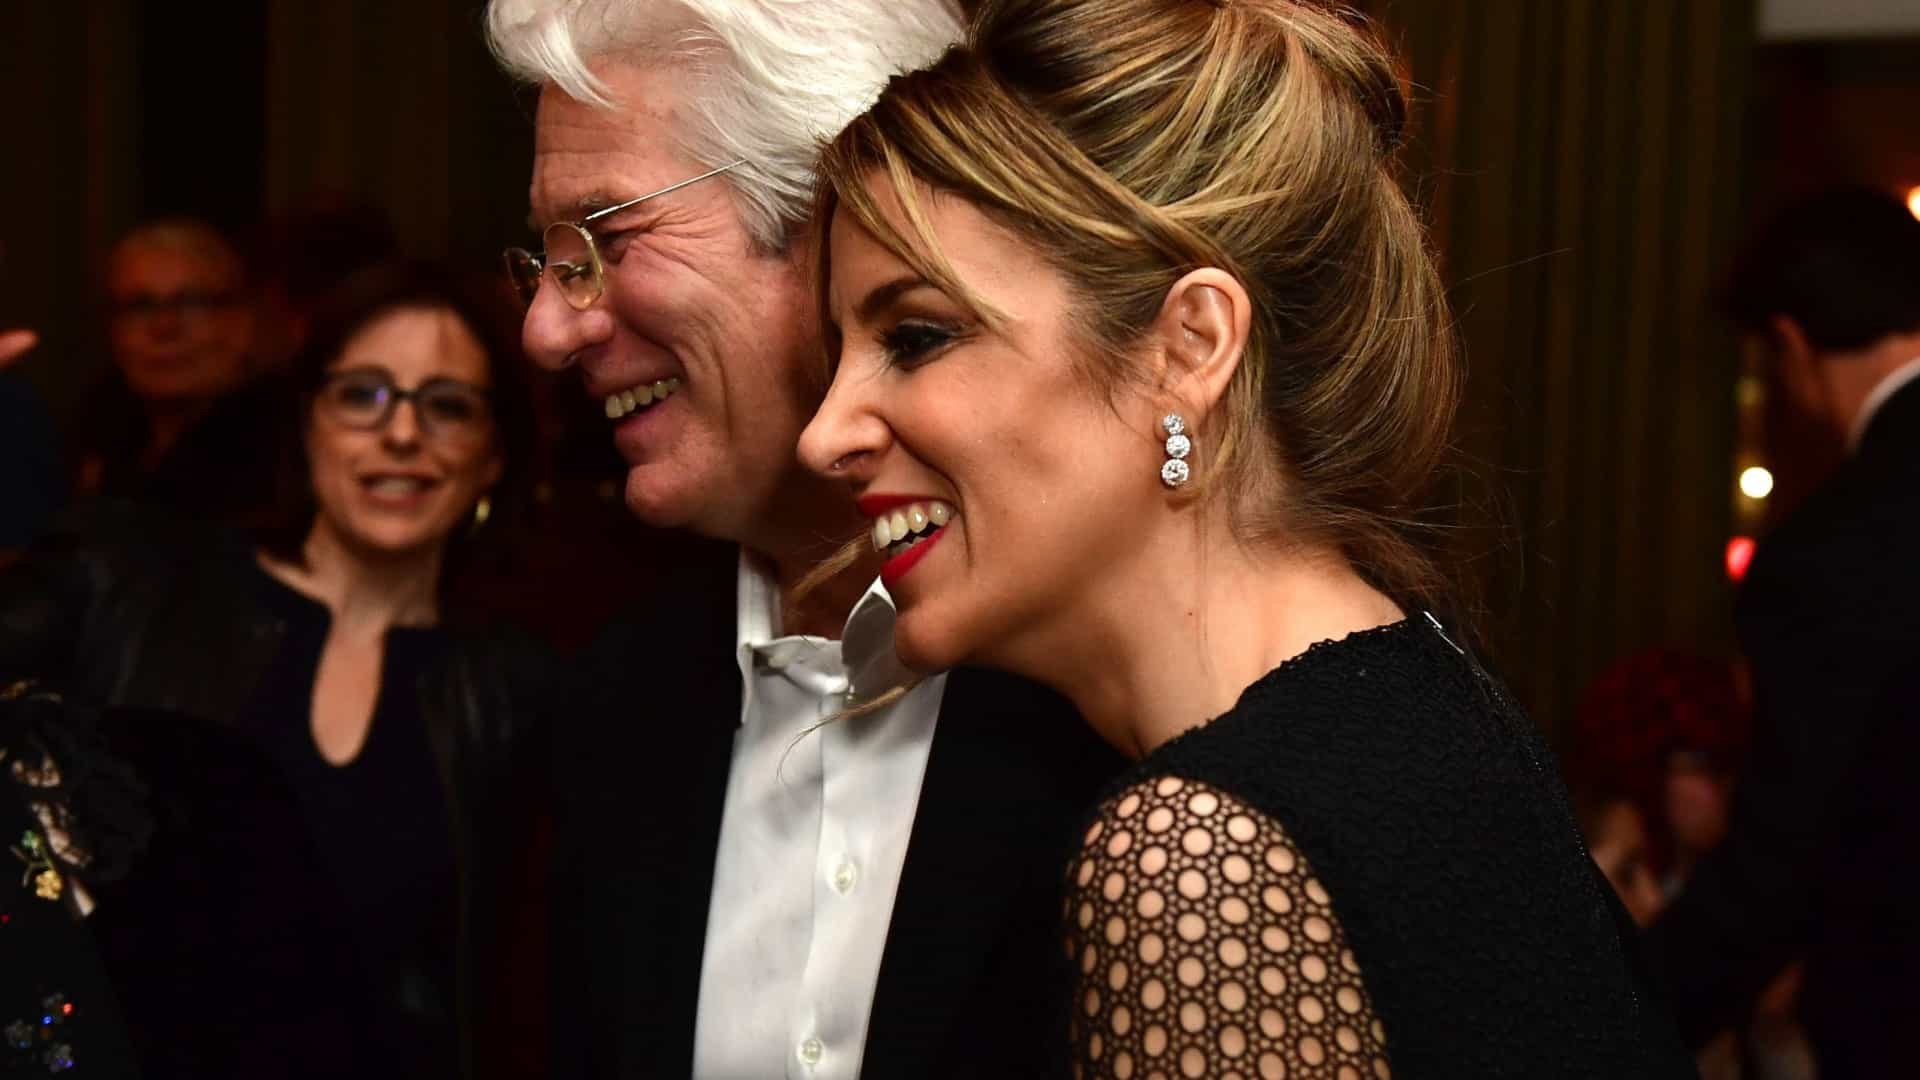 Aos 68 anos, Richard Gere vai ser pai pela terceira vez